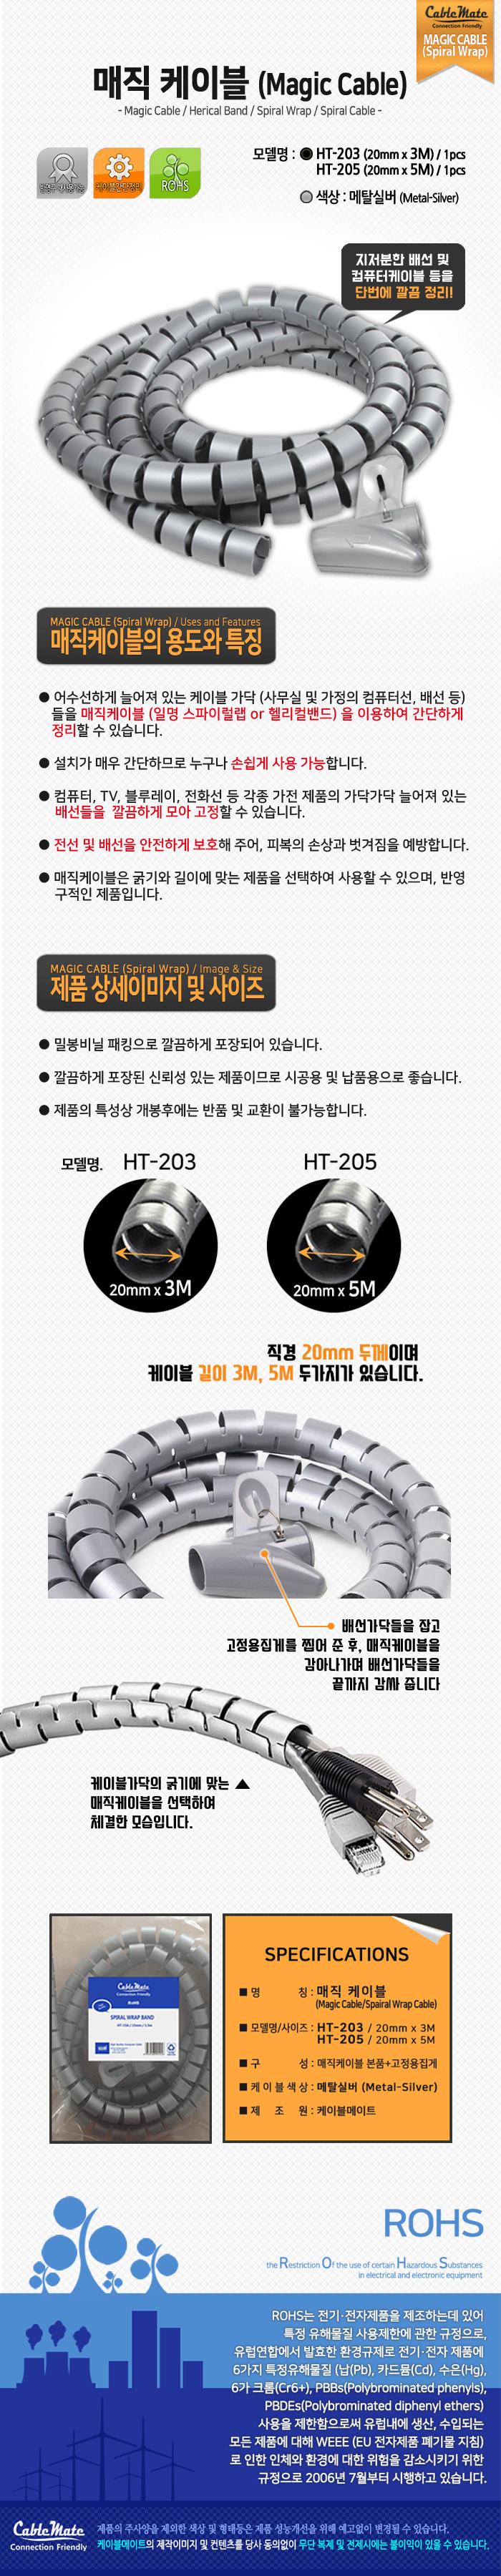 CABLEMATE HT-203 매직케이블 정리기 3m (직경 20mm)